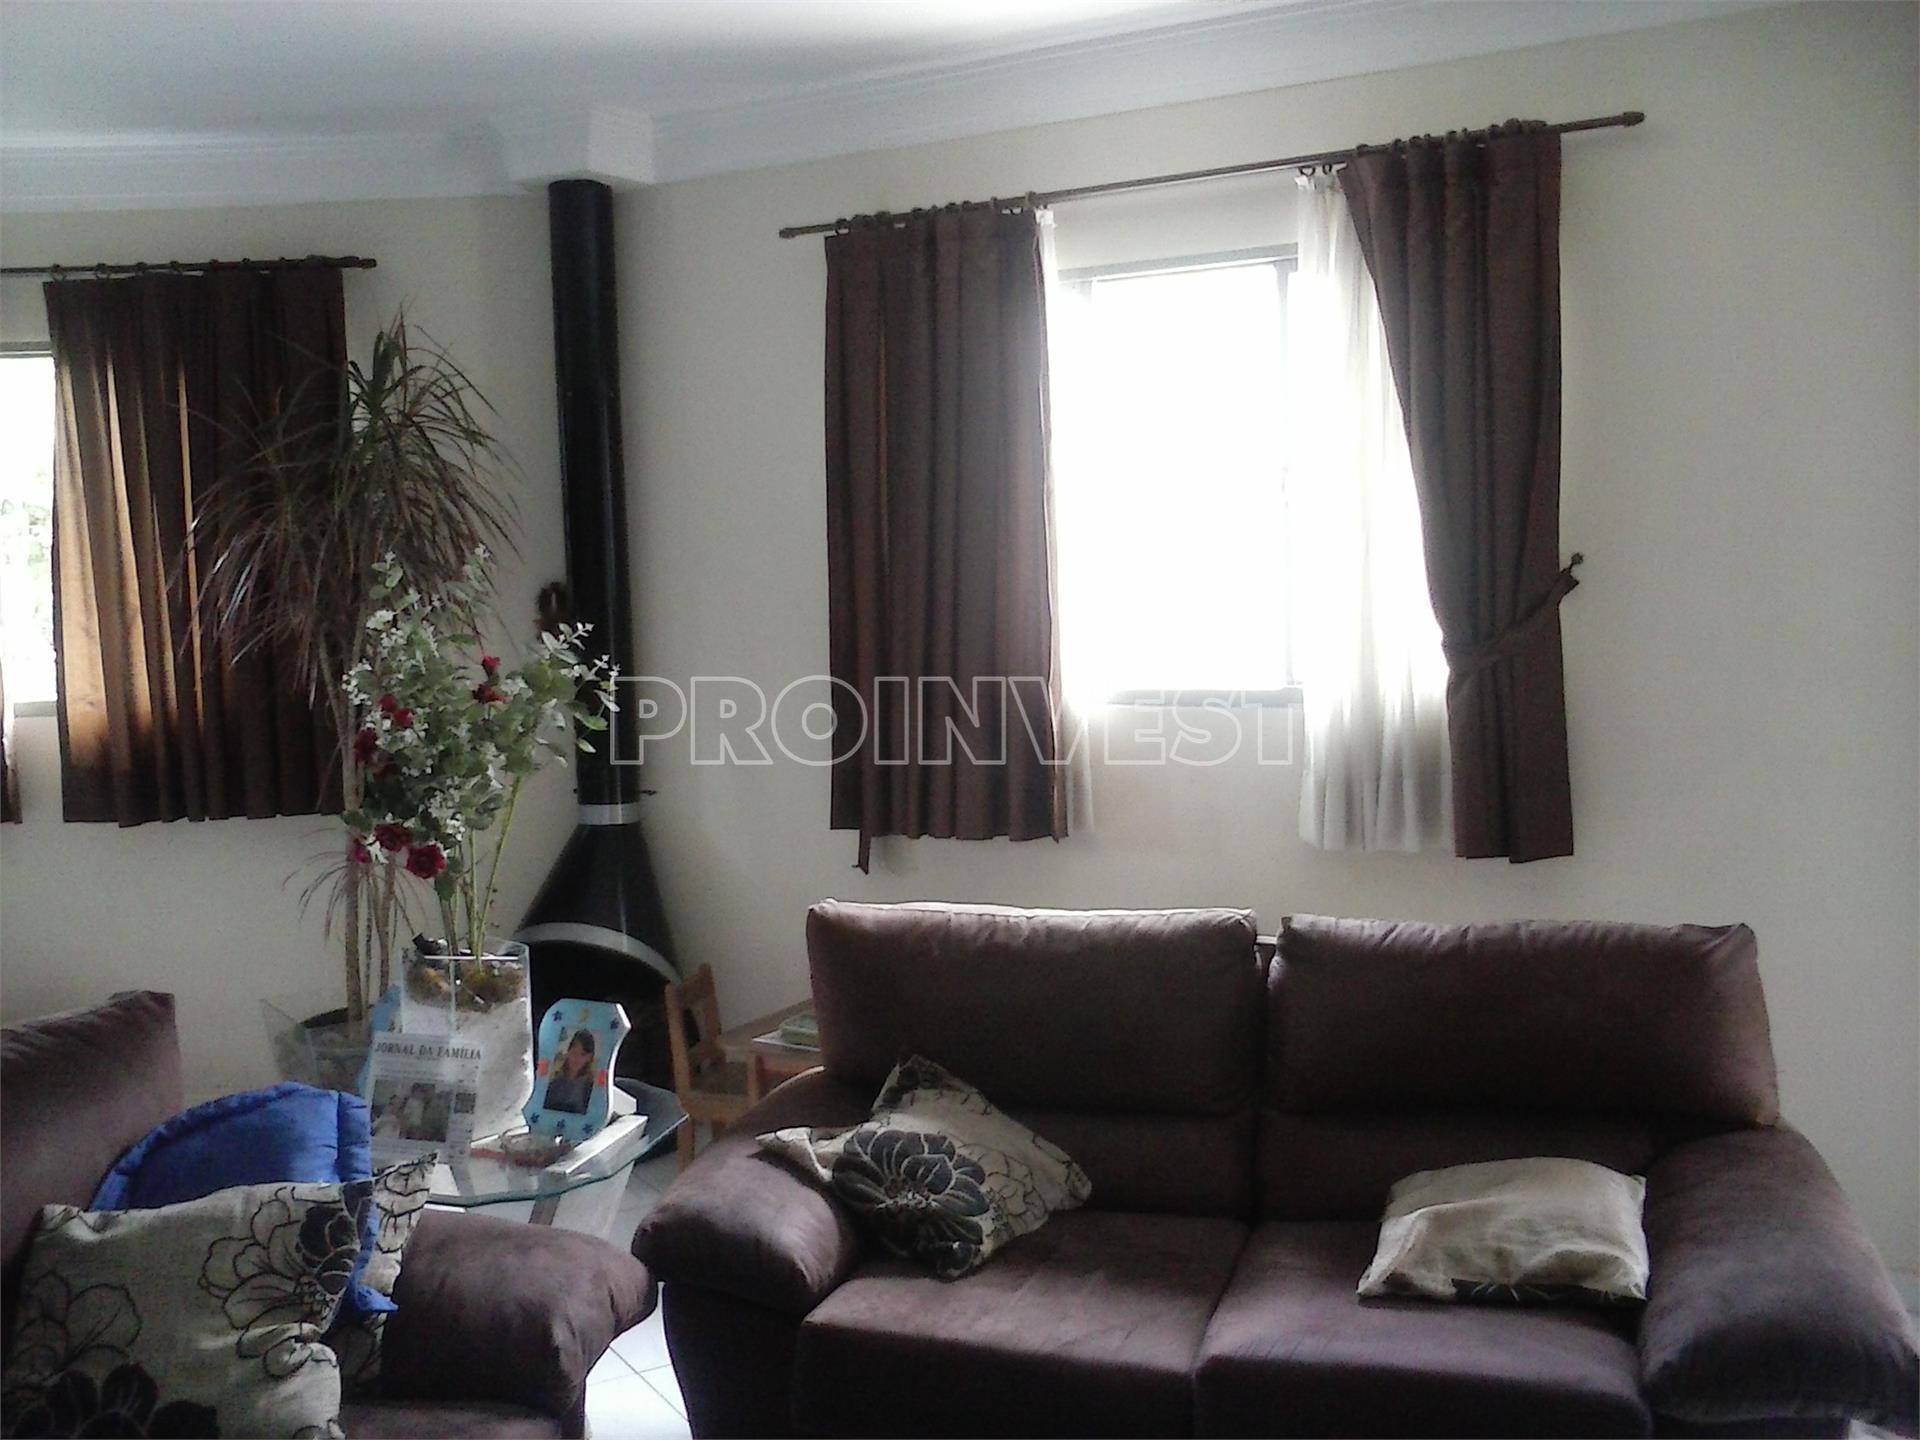 Casa de 3 dormitórios em Jardim Semiramis, Cotia - SP